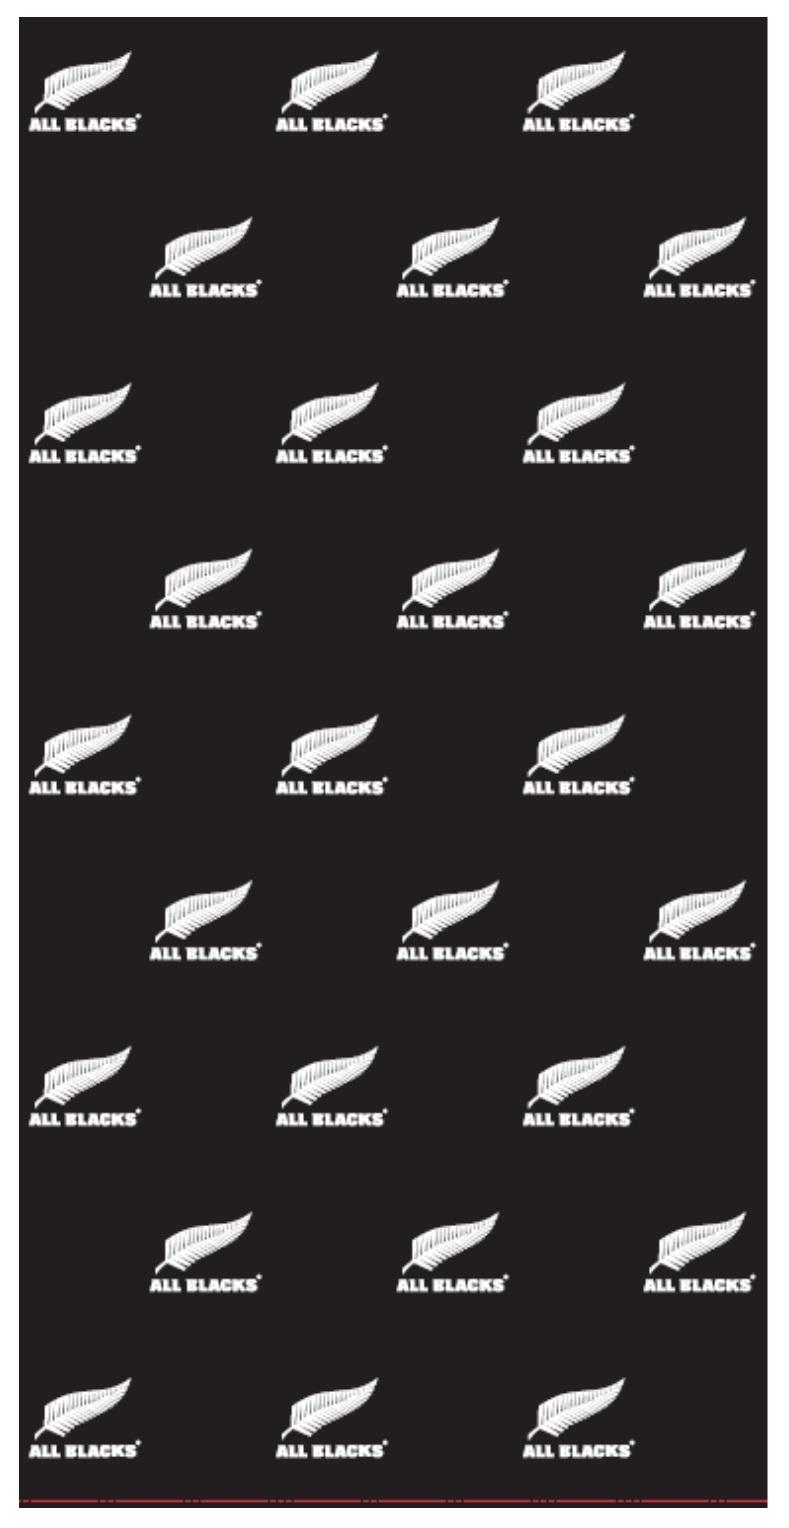 All Blacks: Bandana - Multi 2 image